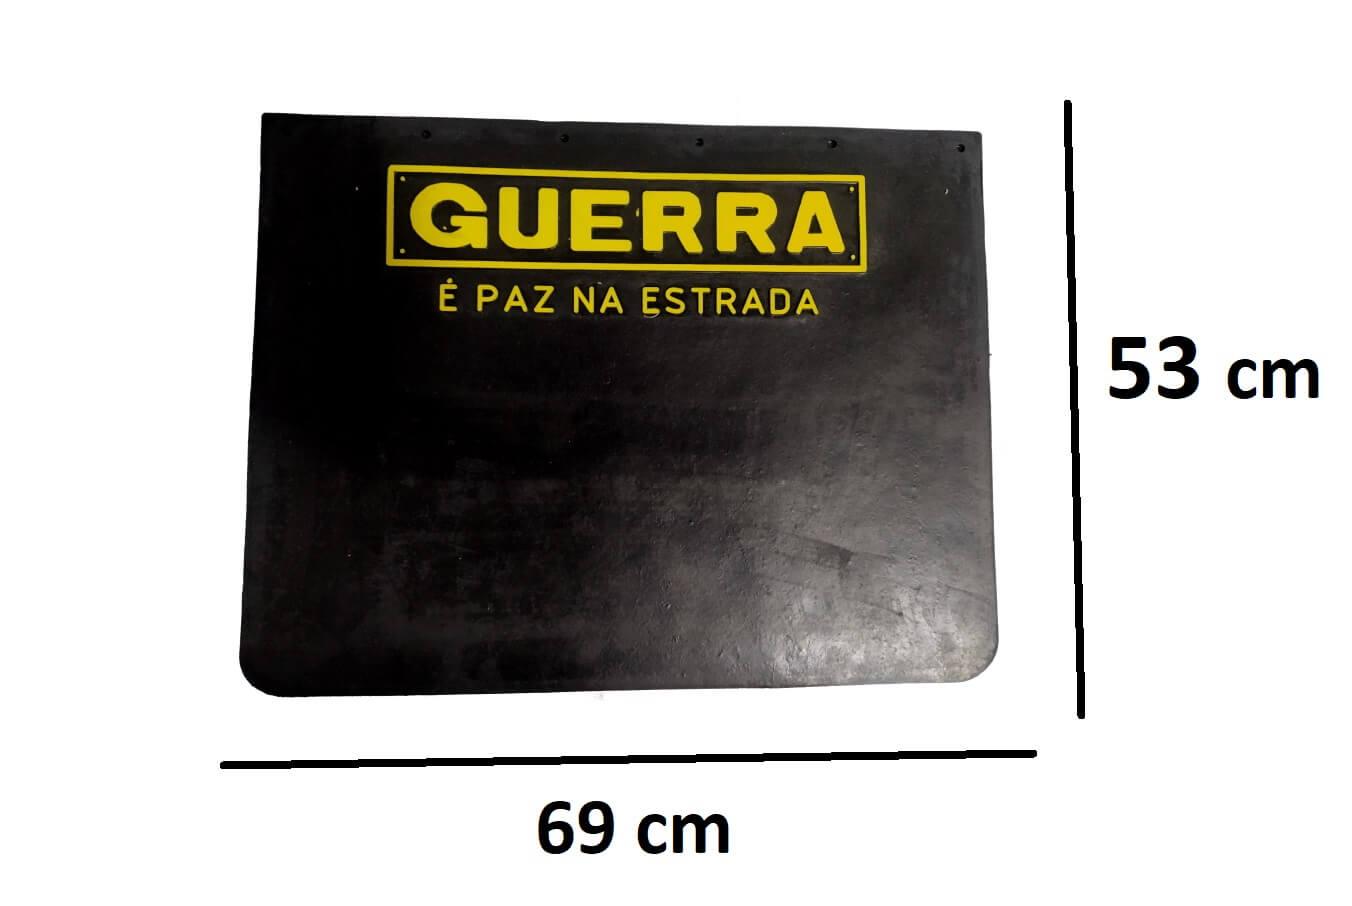 2 Parabarro Borracha Carreta Guerra 53 X 69 Cm Lameiro